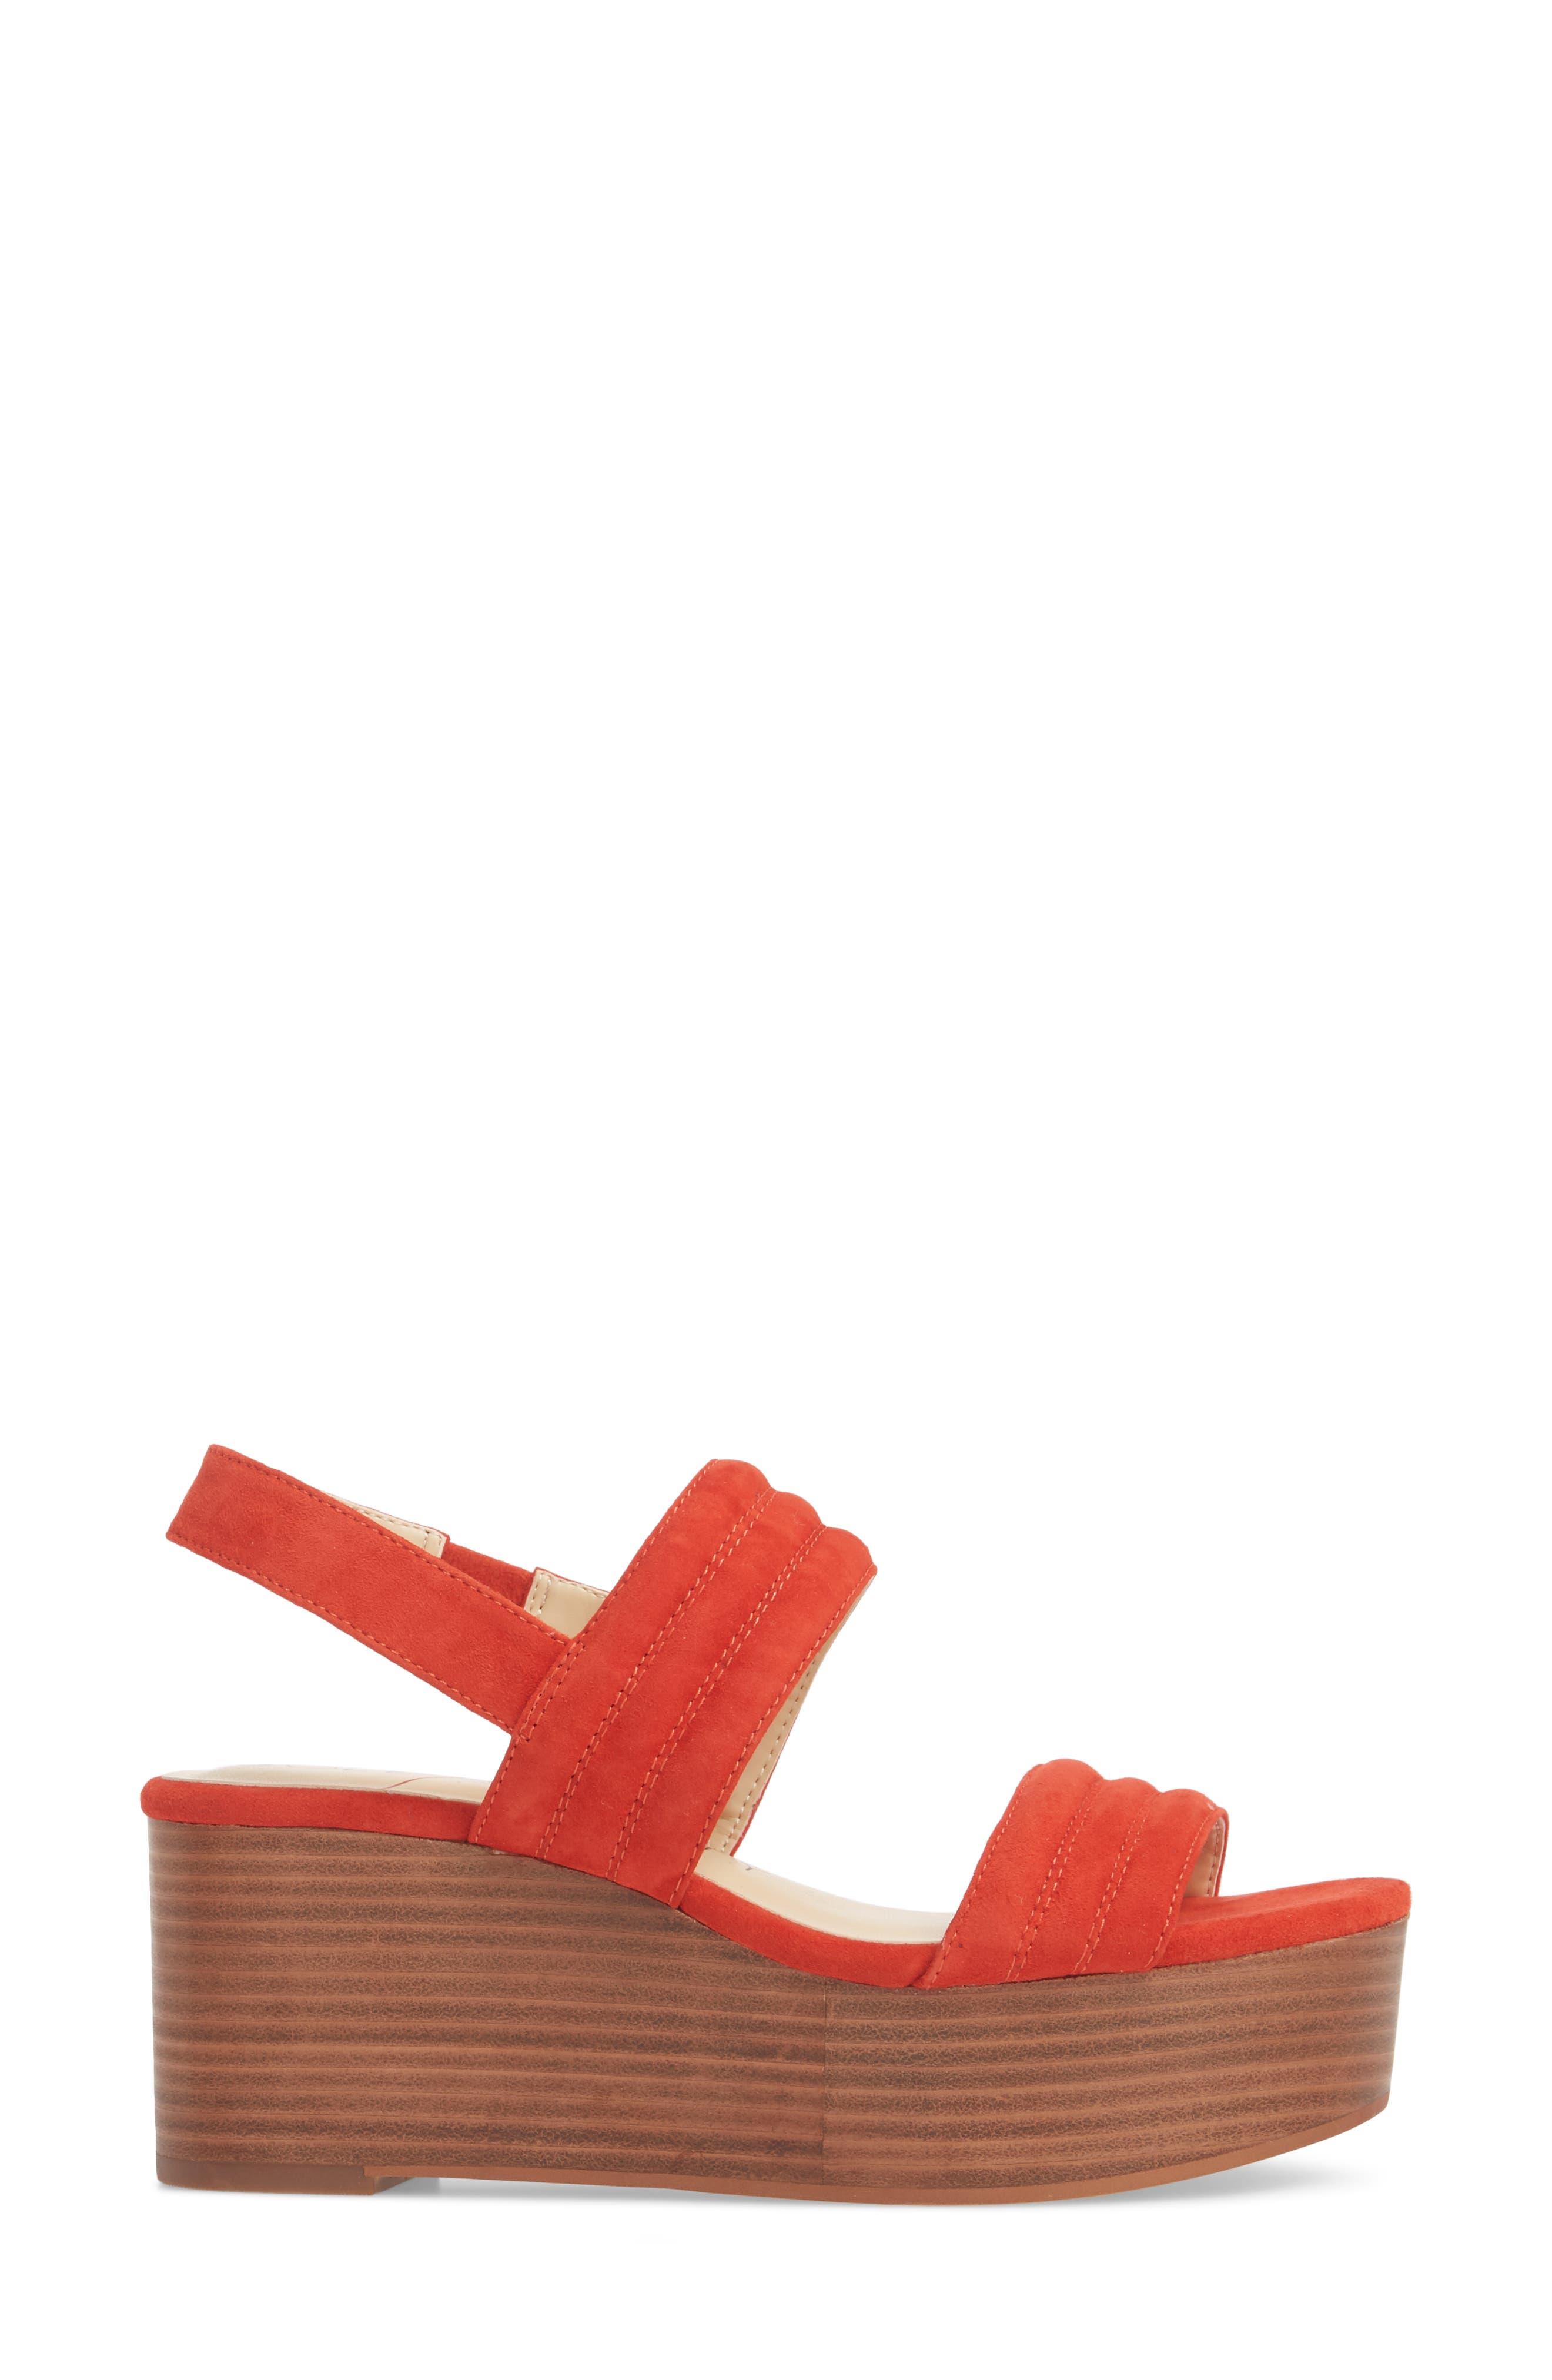 Amberly Platform Sandal,                             Alternate thumbnail 12, color,